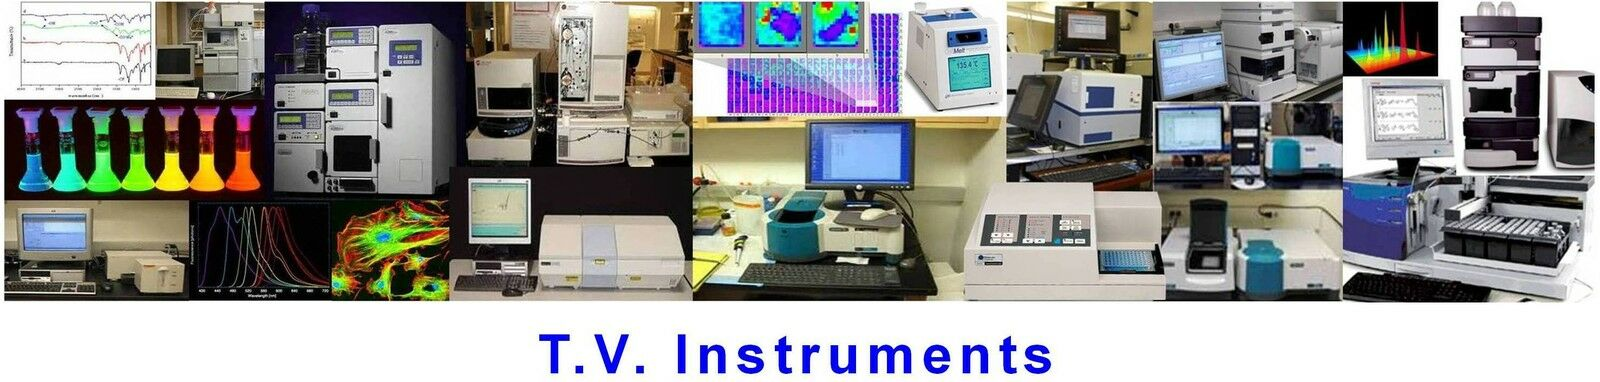 T. V. Instruments